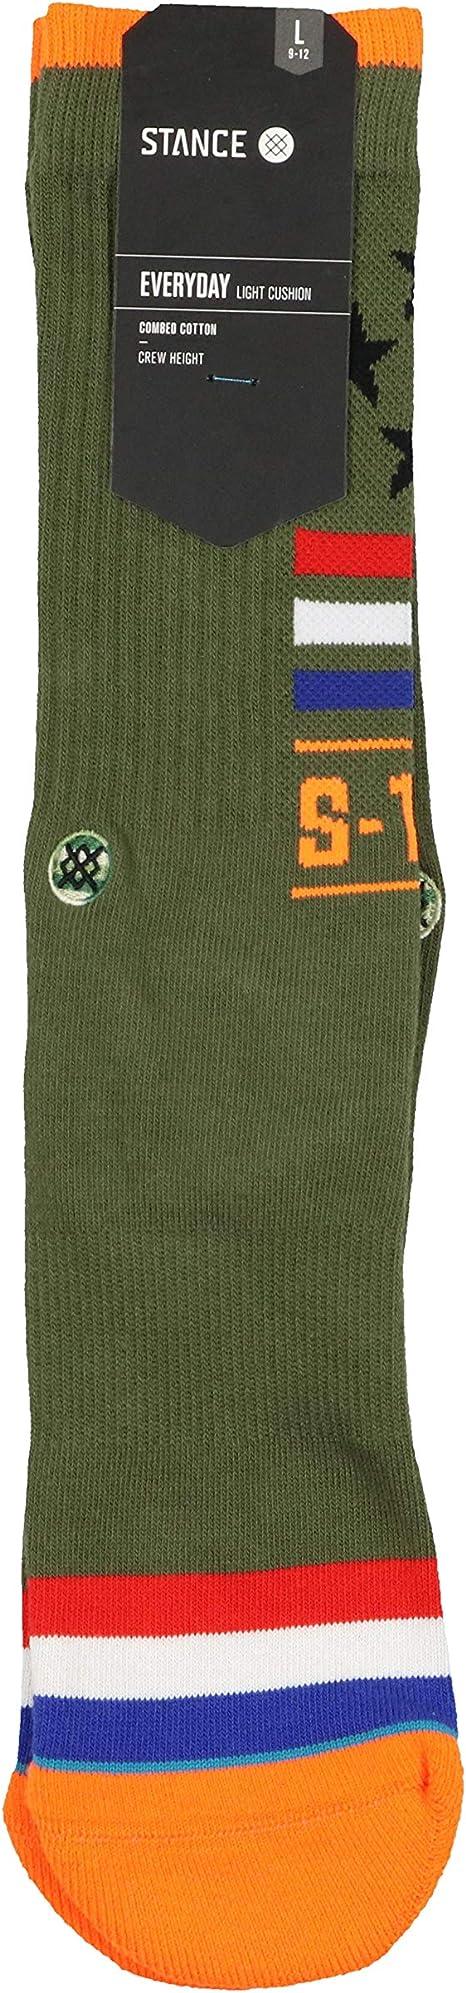 Stance NEW Men/'s Star Fade Socks Green BNWT